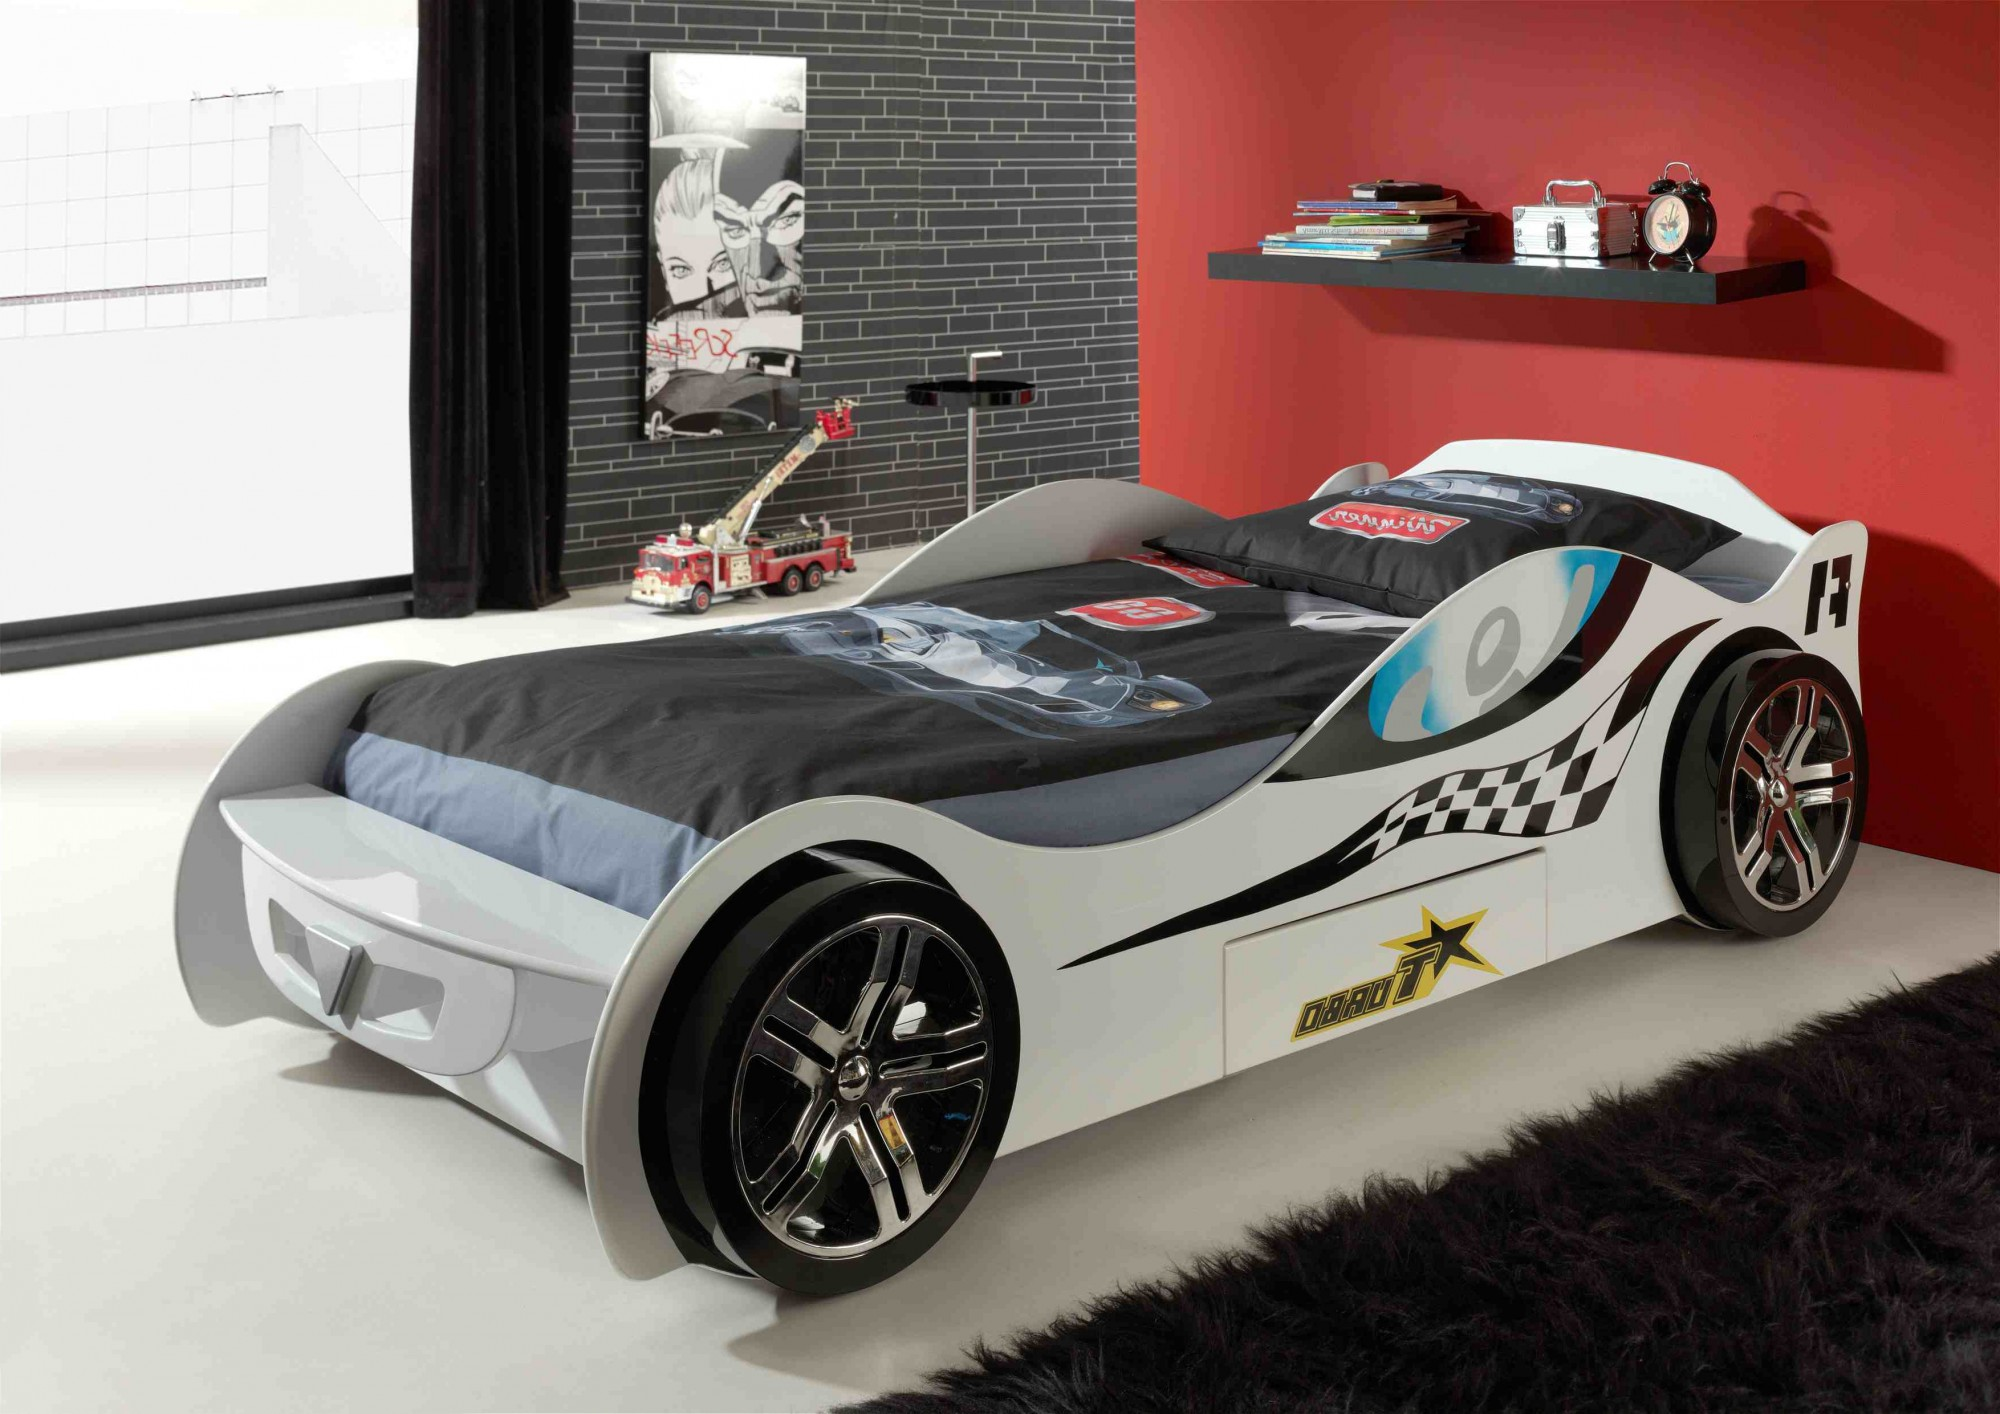 neu kinderbett silverstone autobett rennautobett mit lattenrost 90 x 200 weiss ebay. Black Bedroom Furniture Sets. Home Design Ideas